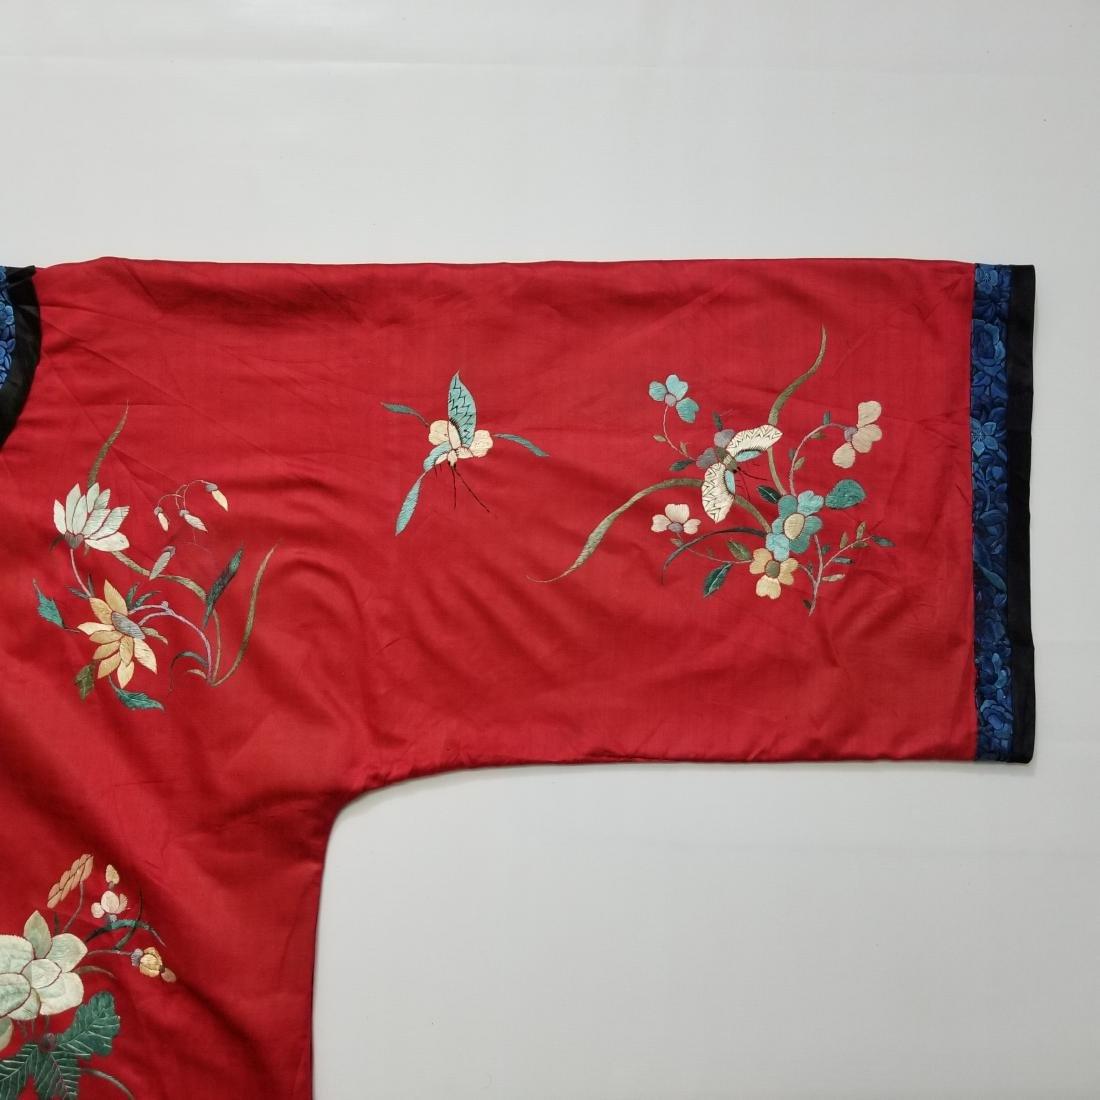 Antique Chinese Silk Hand Embroidered Silk Robe - 4